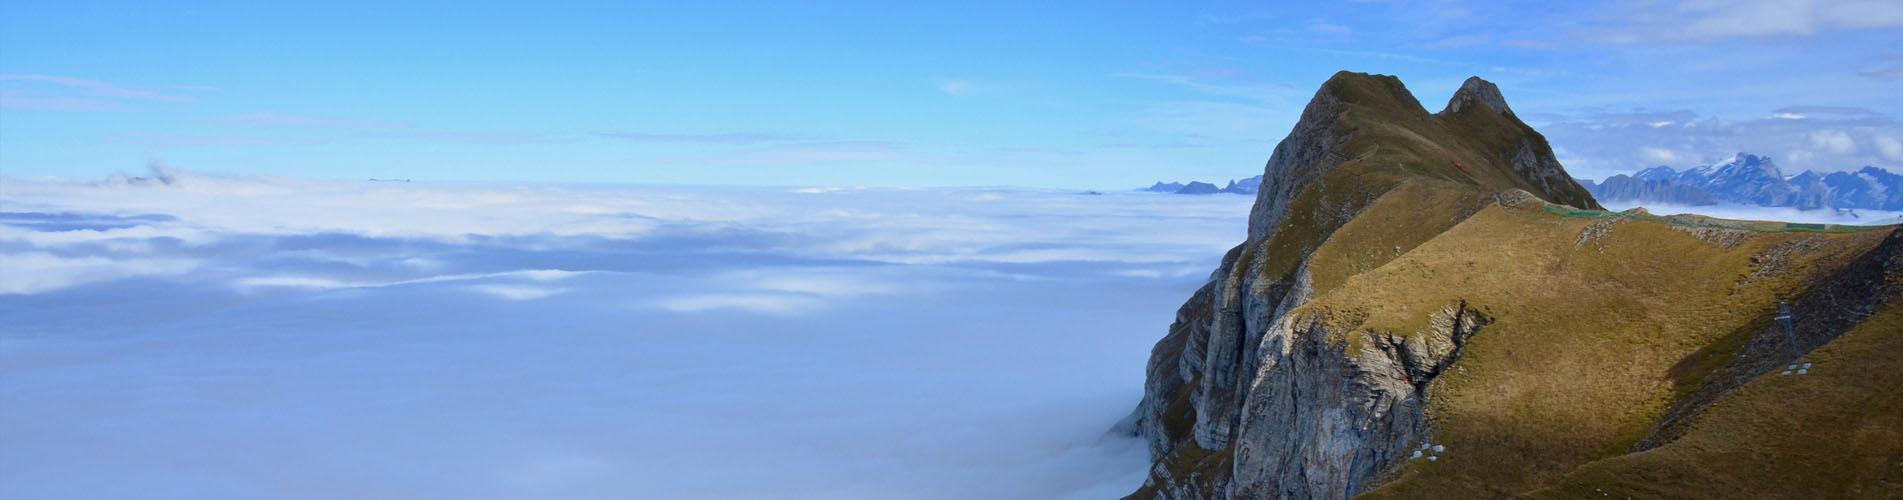 Wanderungen über dem Nebelmeer, dem Nebel jetzt entfliehen